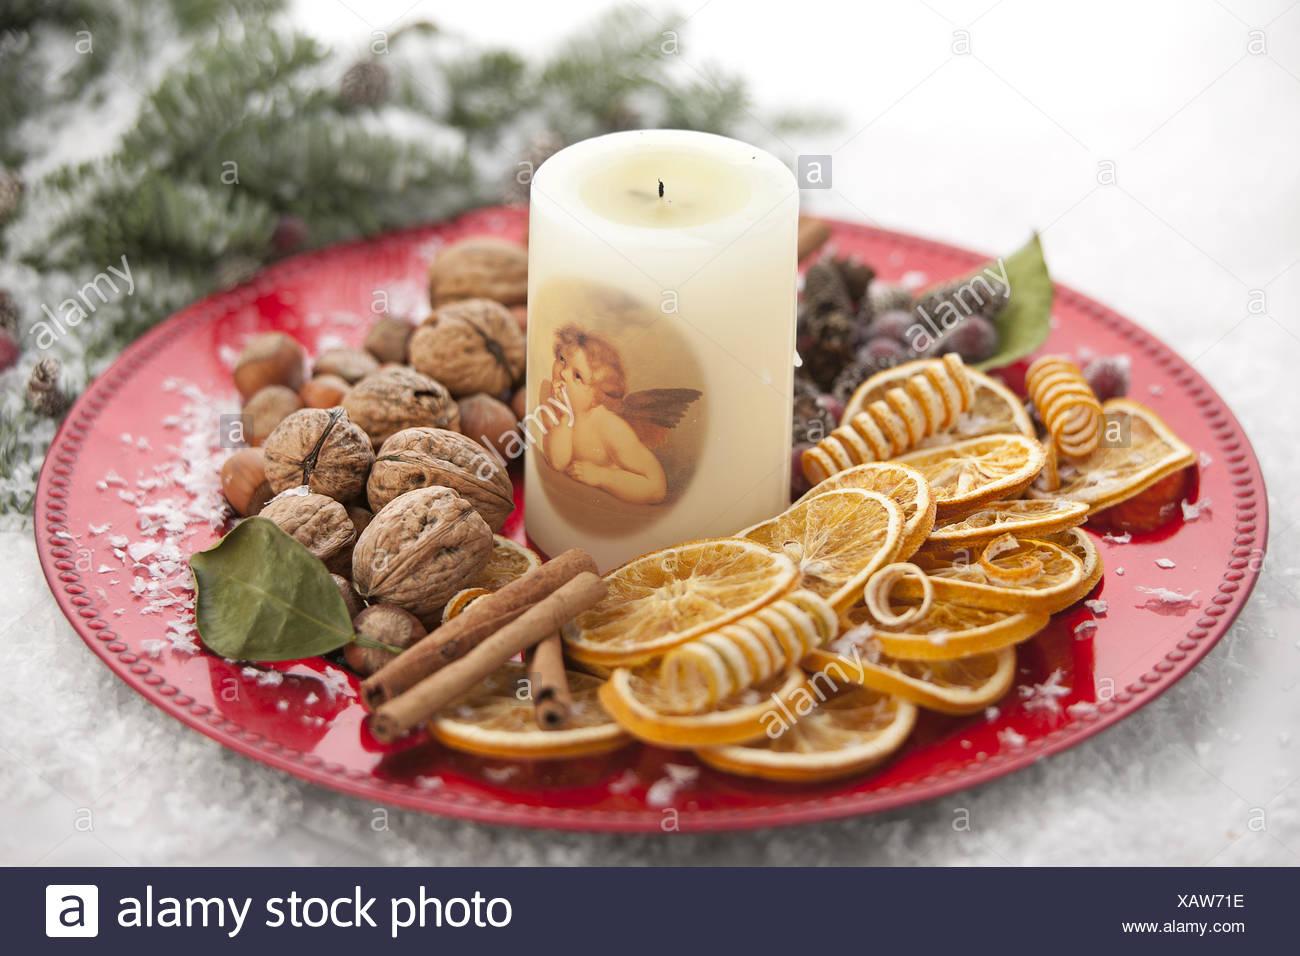 Weihnachtsdüfte Stock Photos & Weihnachtsdüfte Stock Images - Alamy